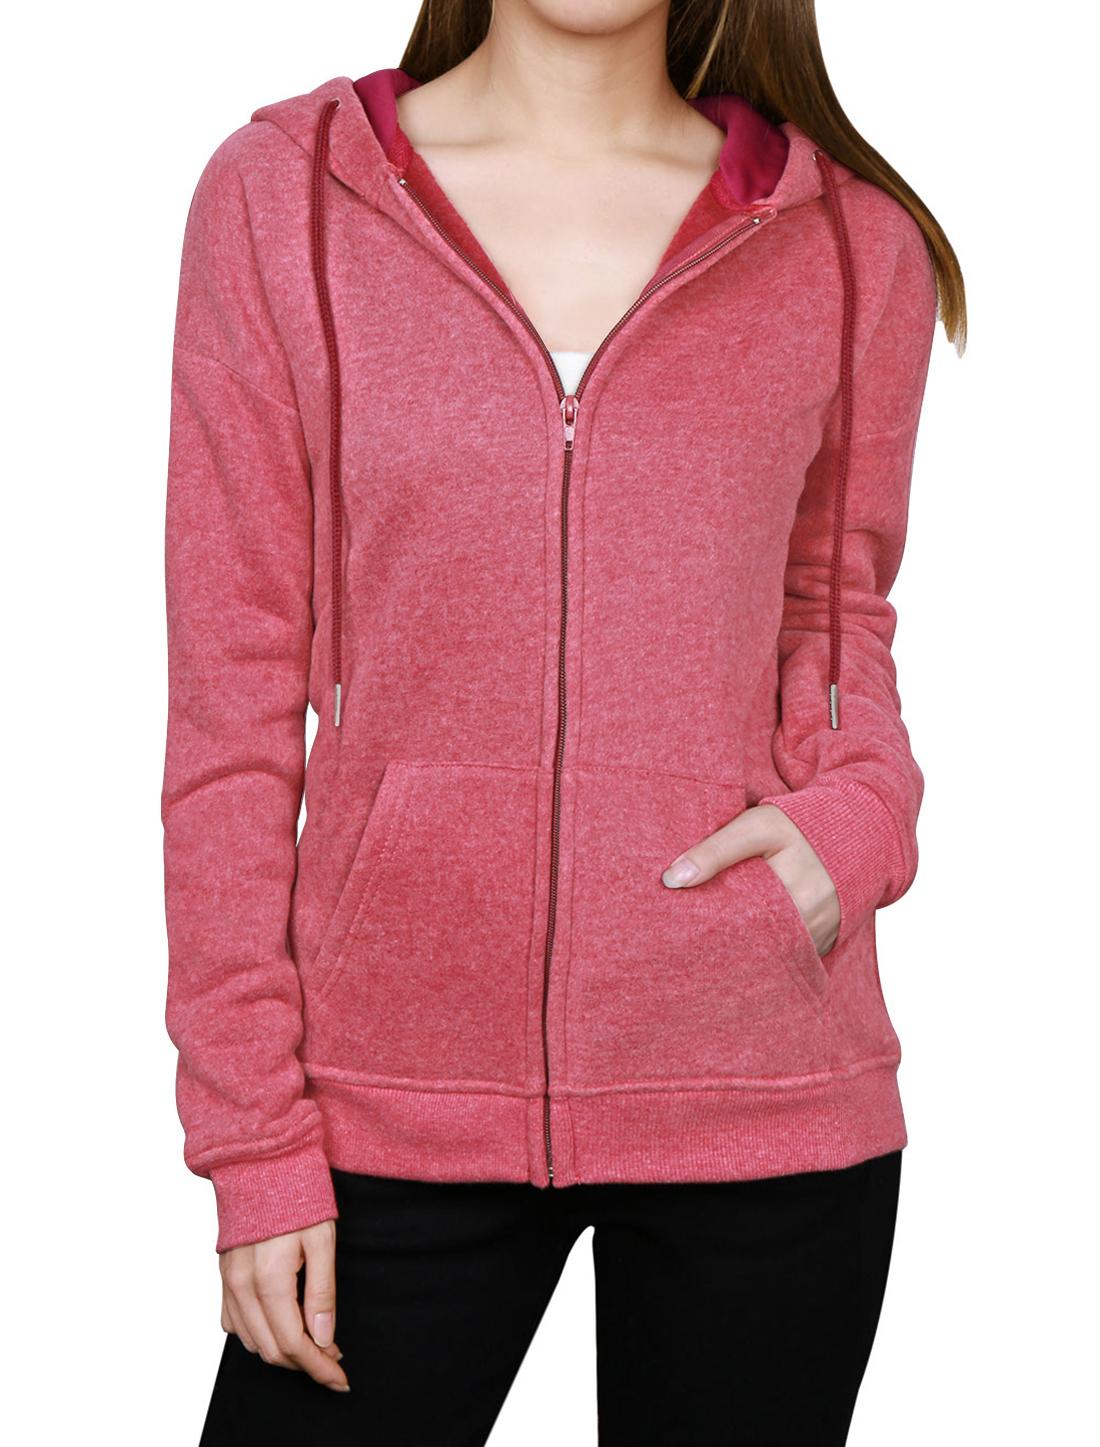 Woman Kangaroo Pocket Zip Up Soft Lined Drawstring Hoodie Red S